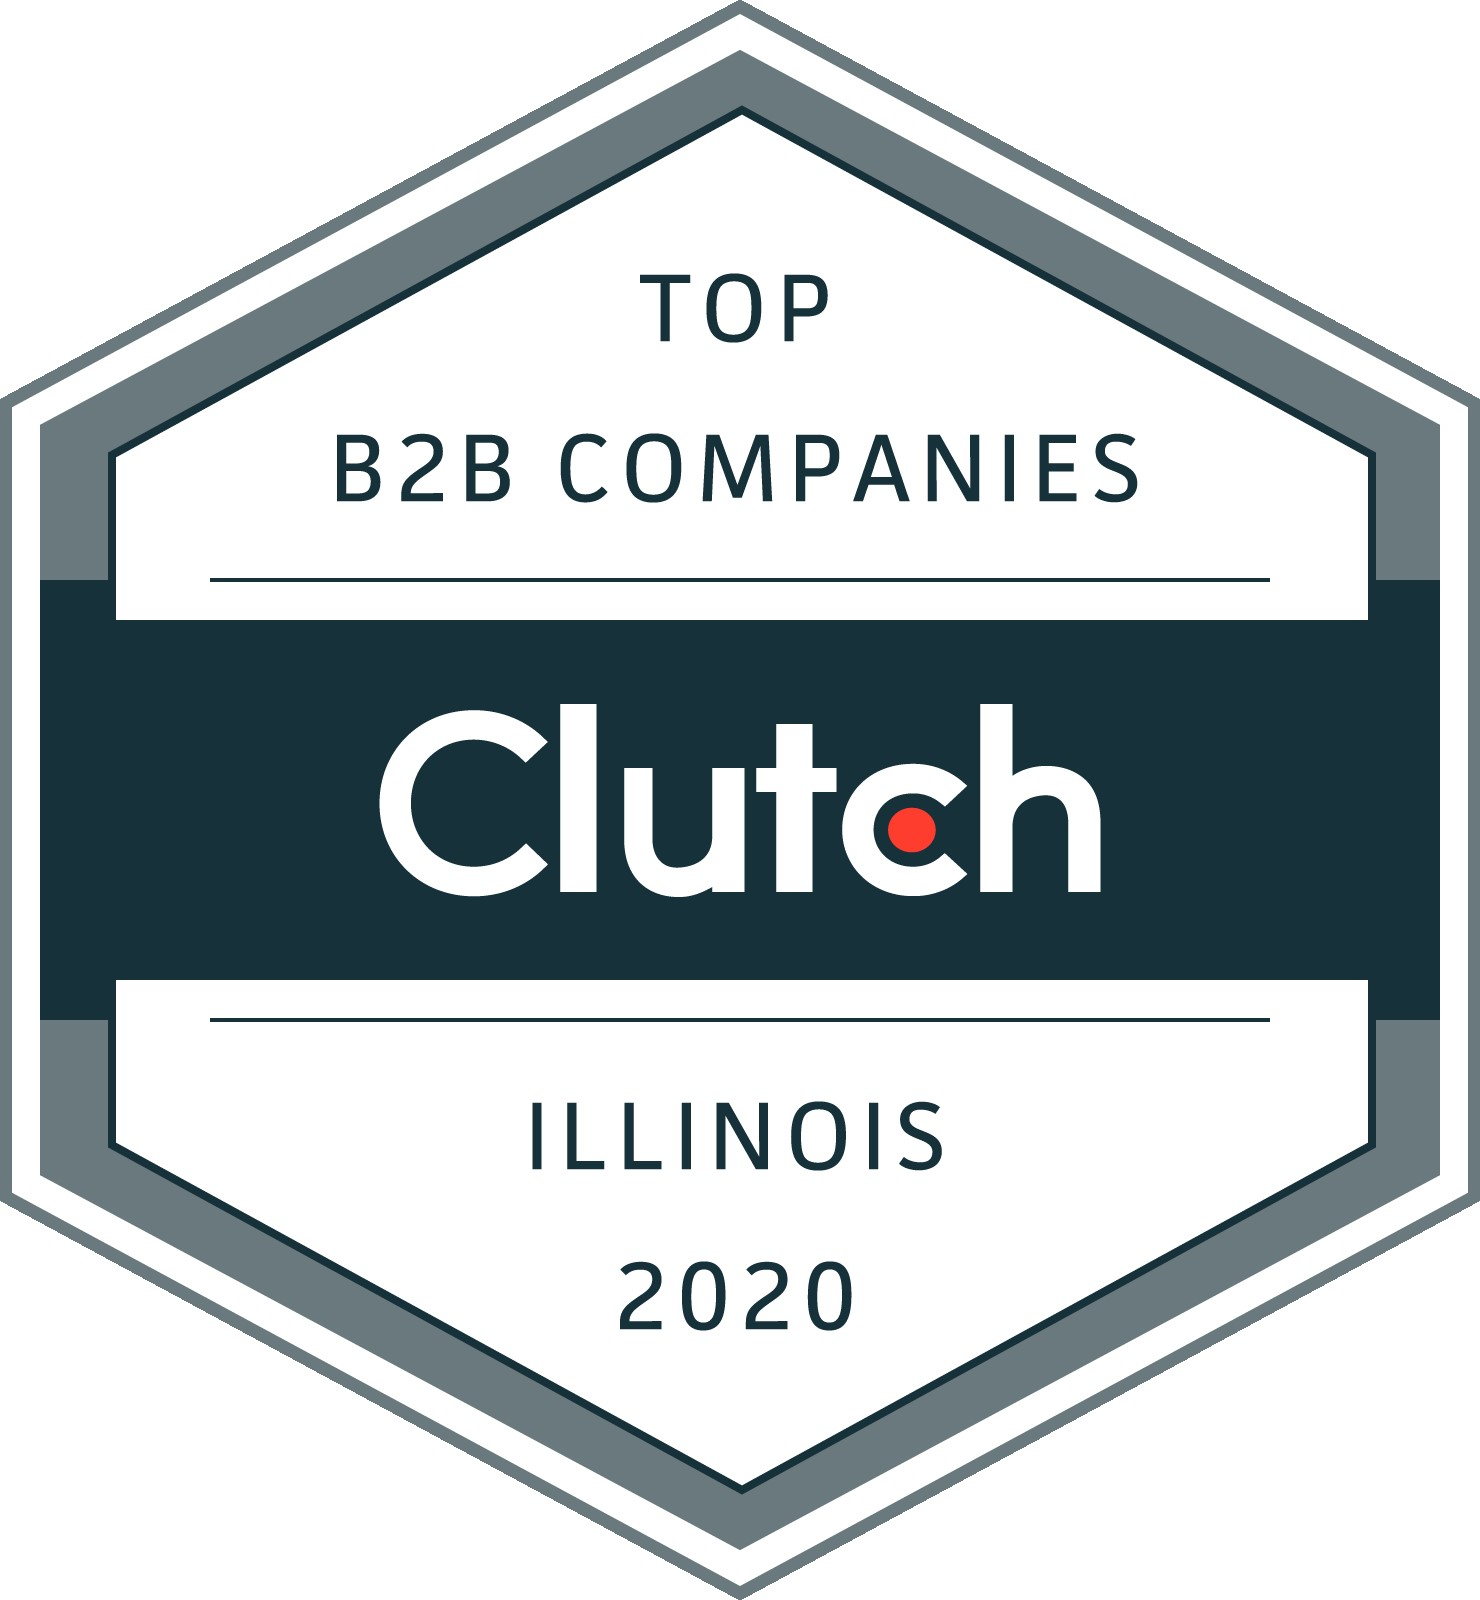 LMG Awarded as a Top Digital Marketing Agency for B2B Companies by Clutch